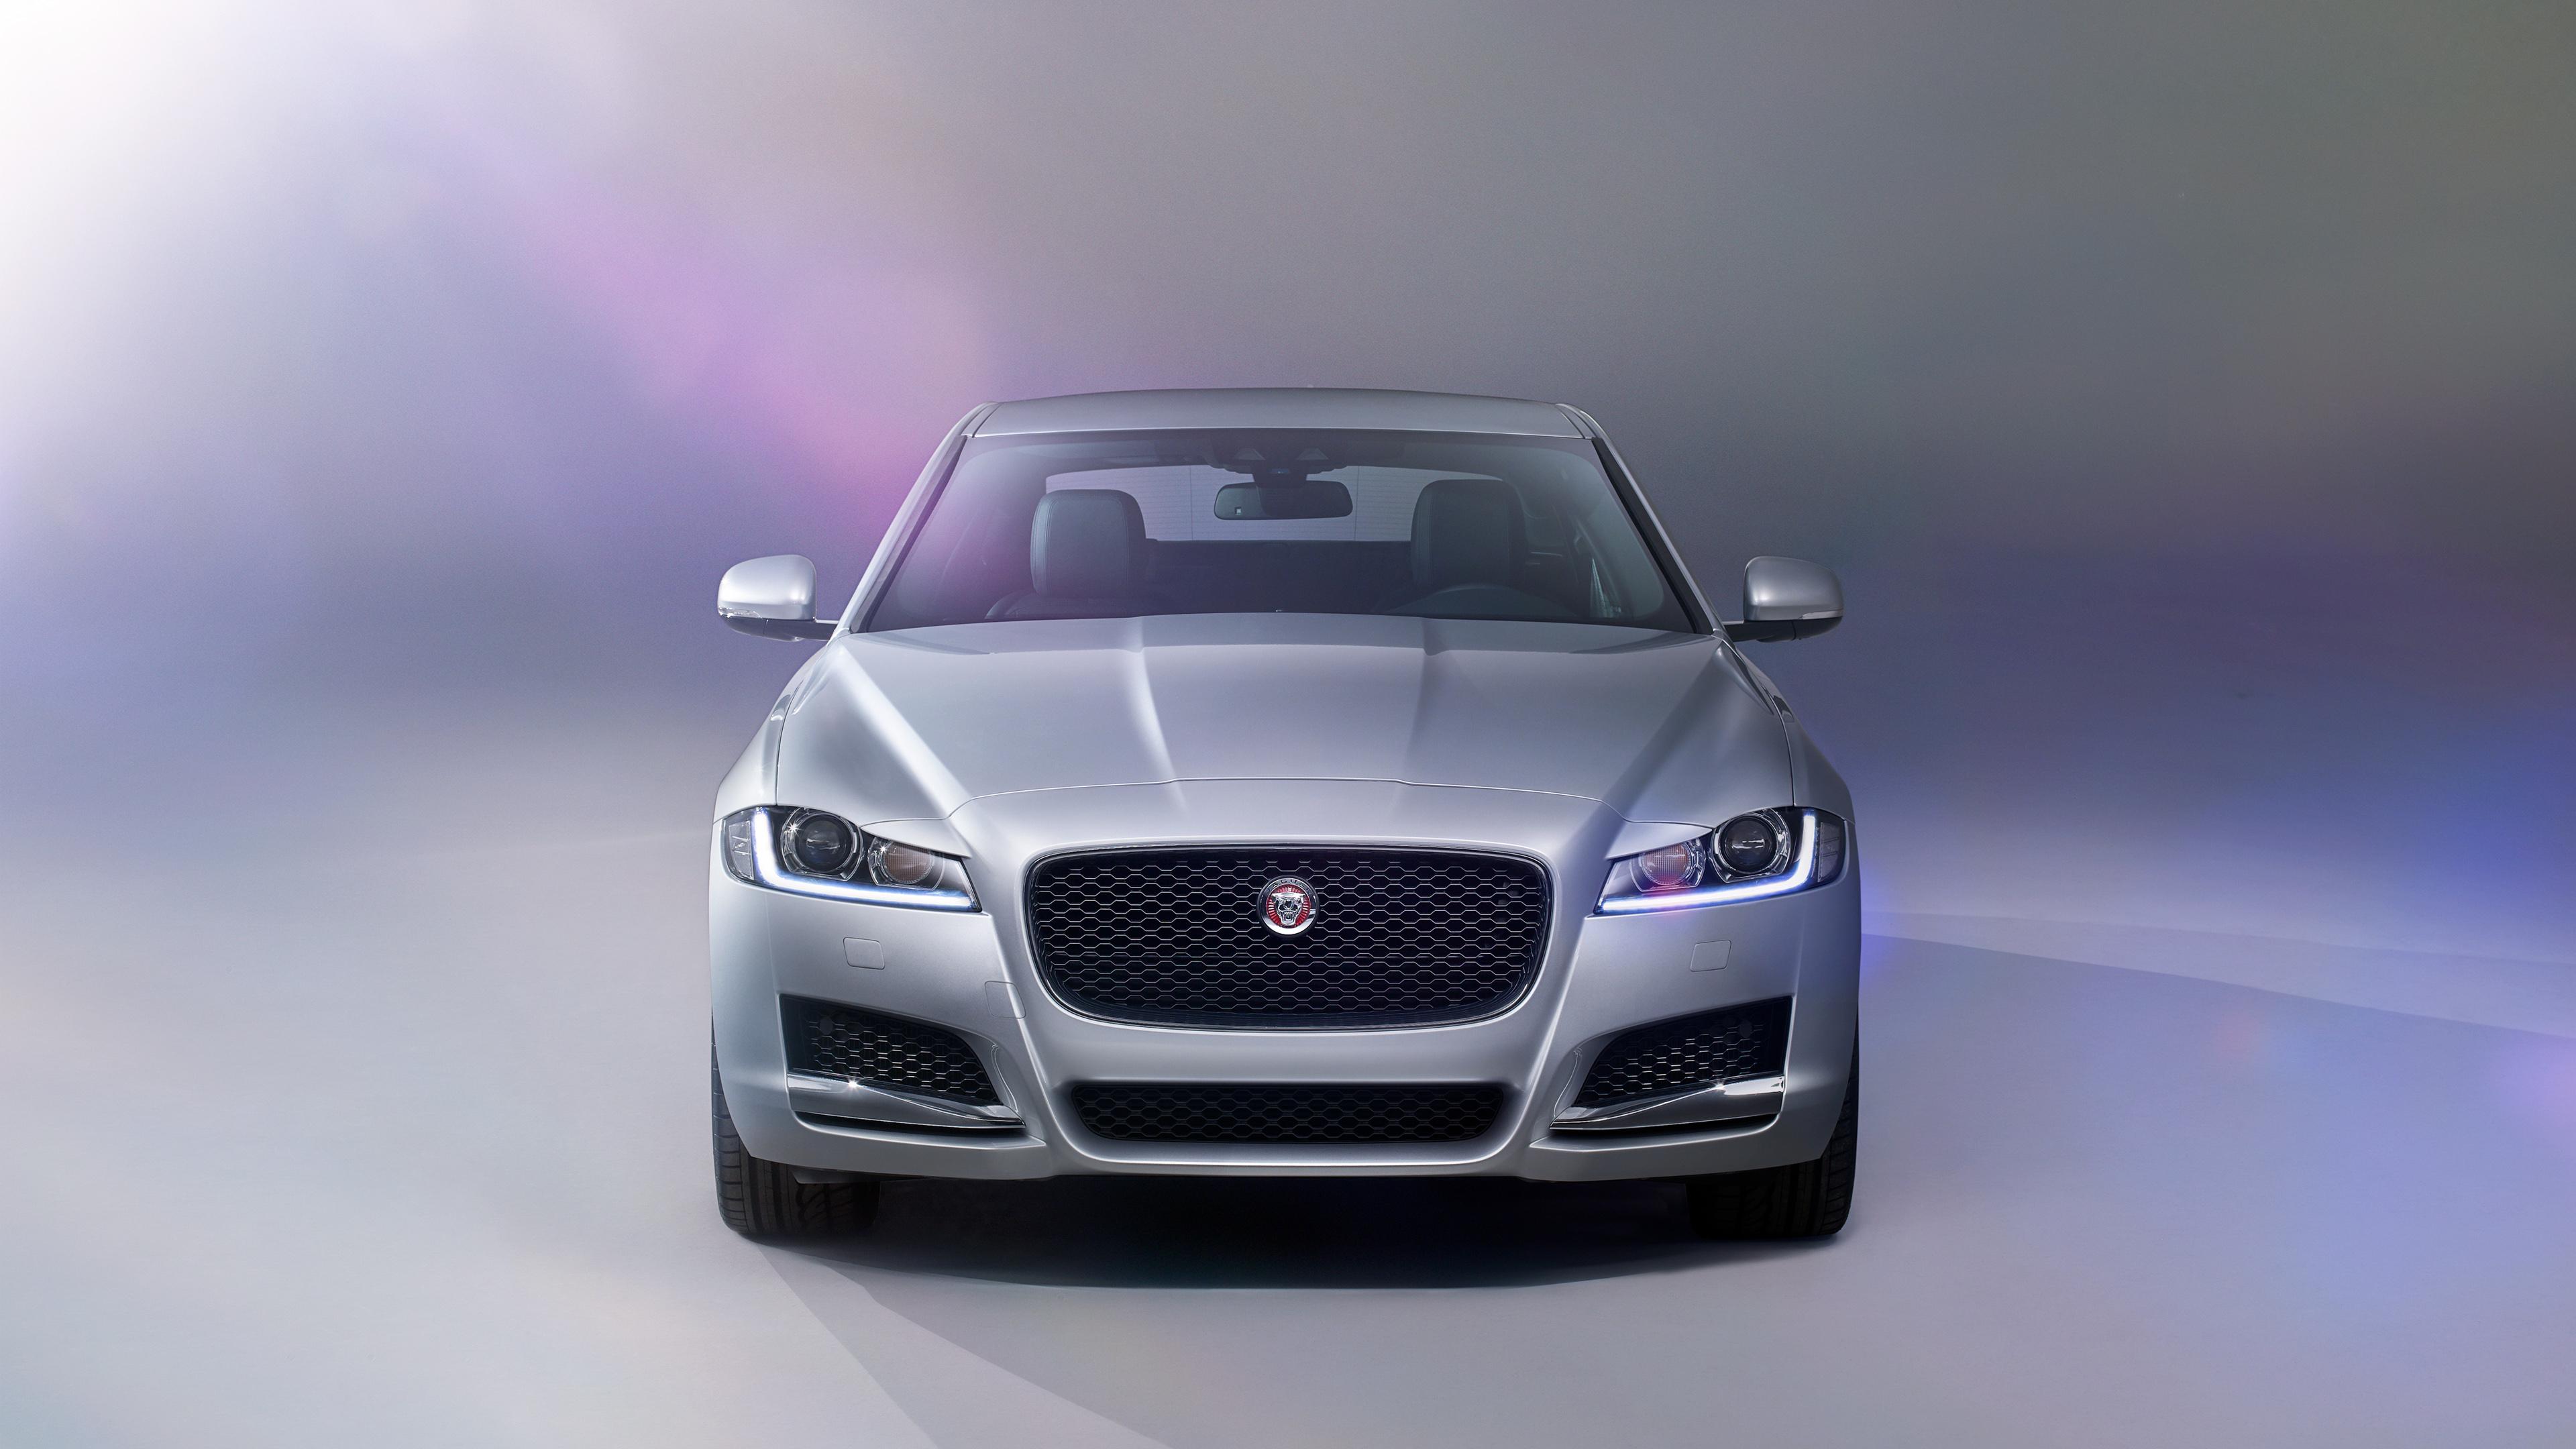 Wallpaper download jaguar - 2015 Jaguar Xf Prestige Wallpaper Hd Car Wallpapers